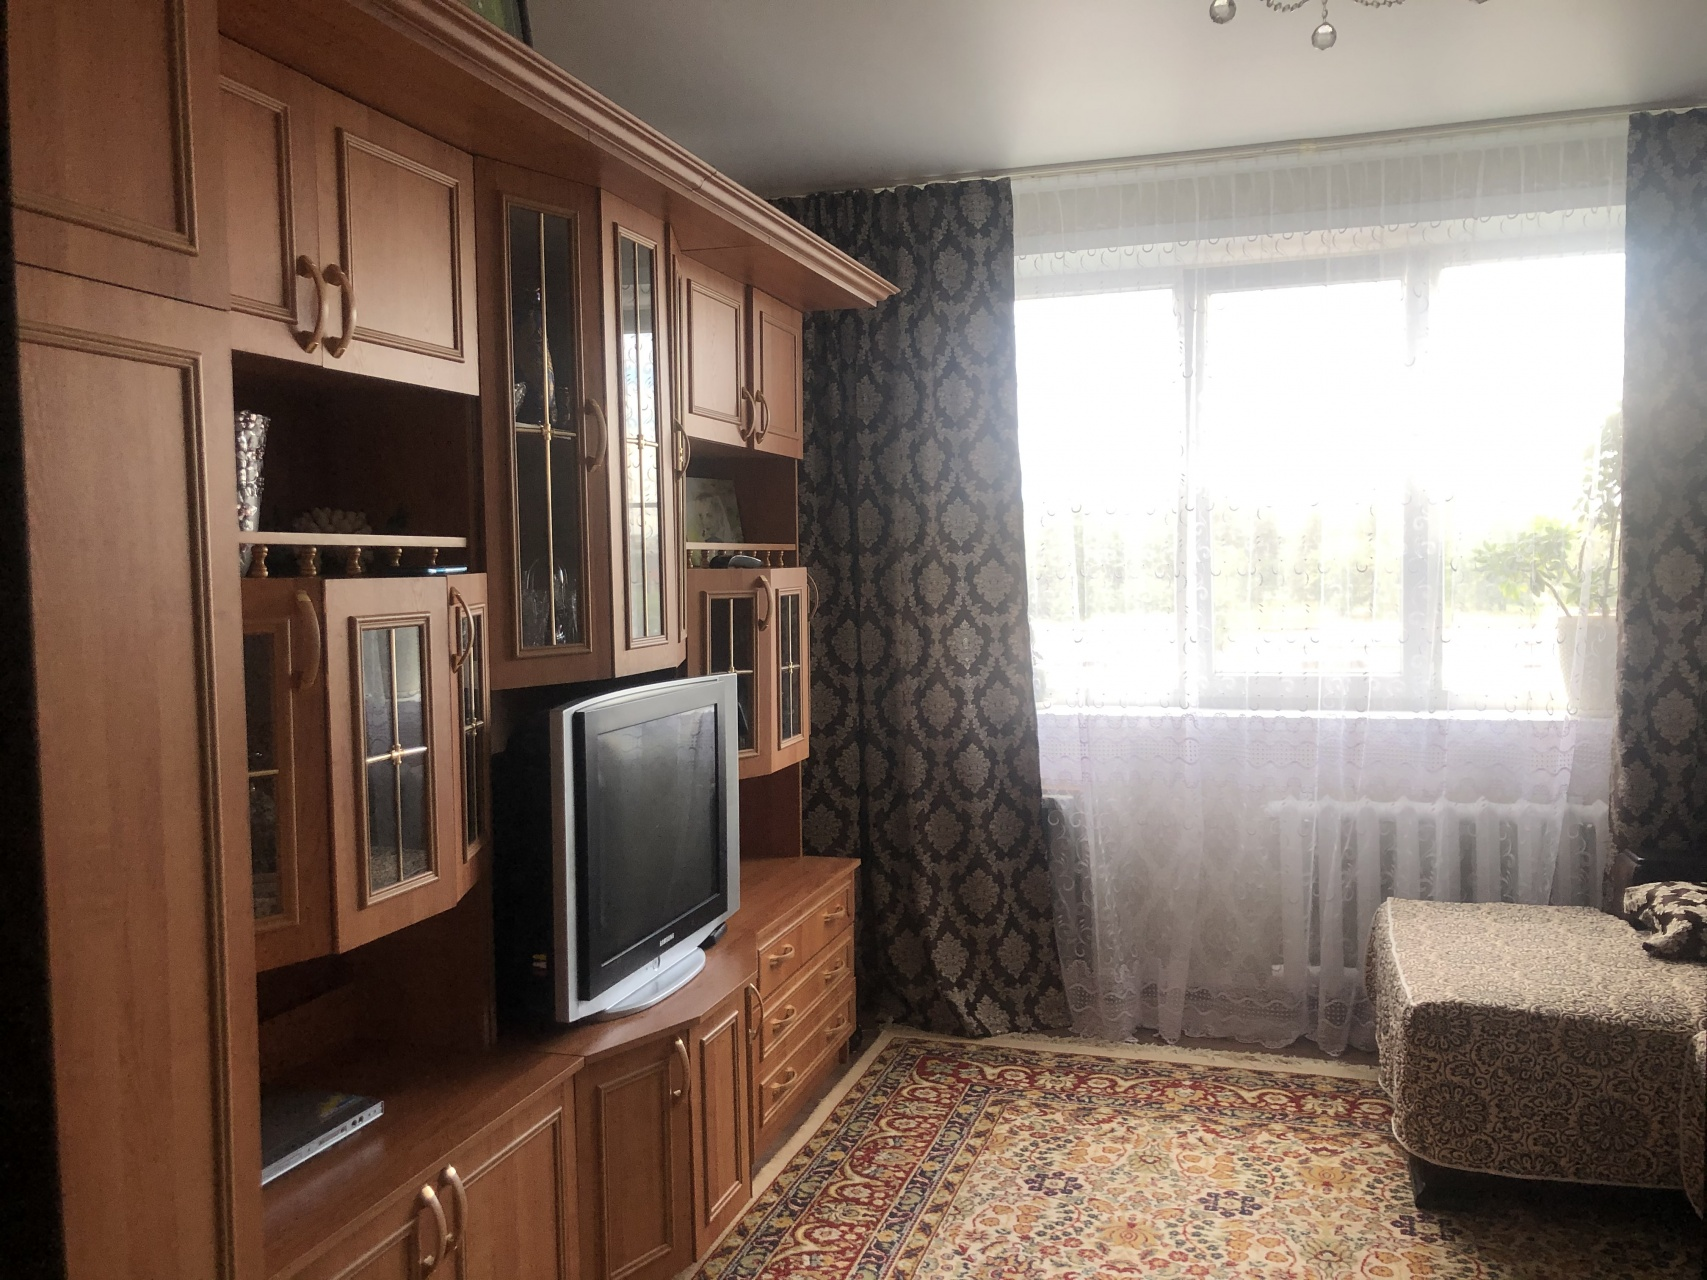 г. Ковров, Ватутина ул., 45, 3-к. квартира на продажу